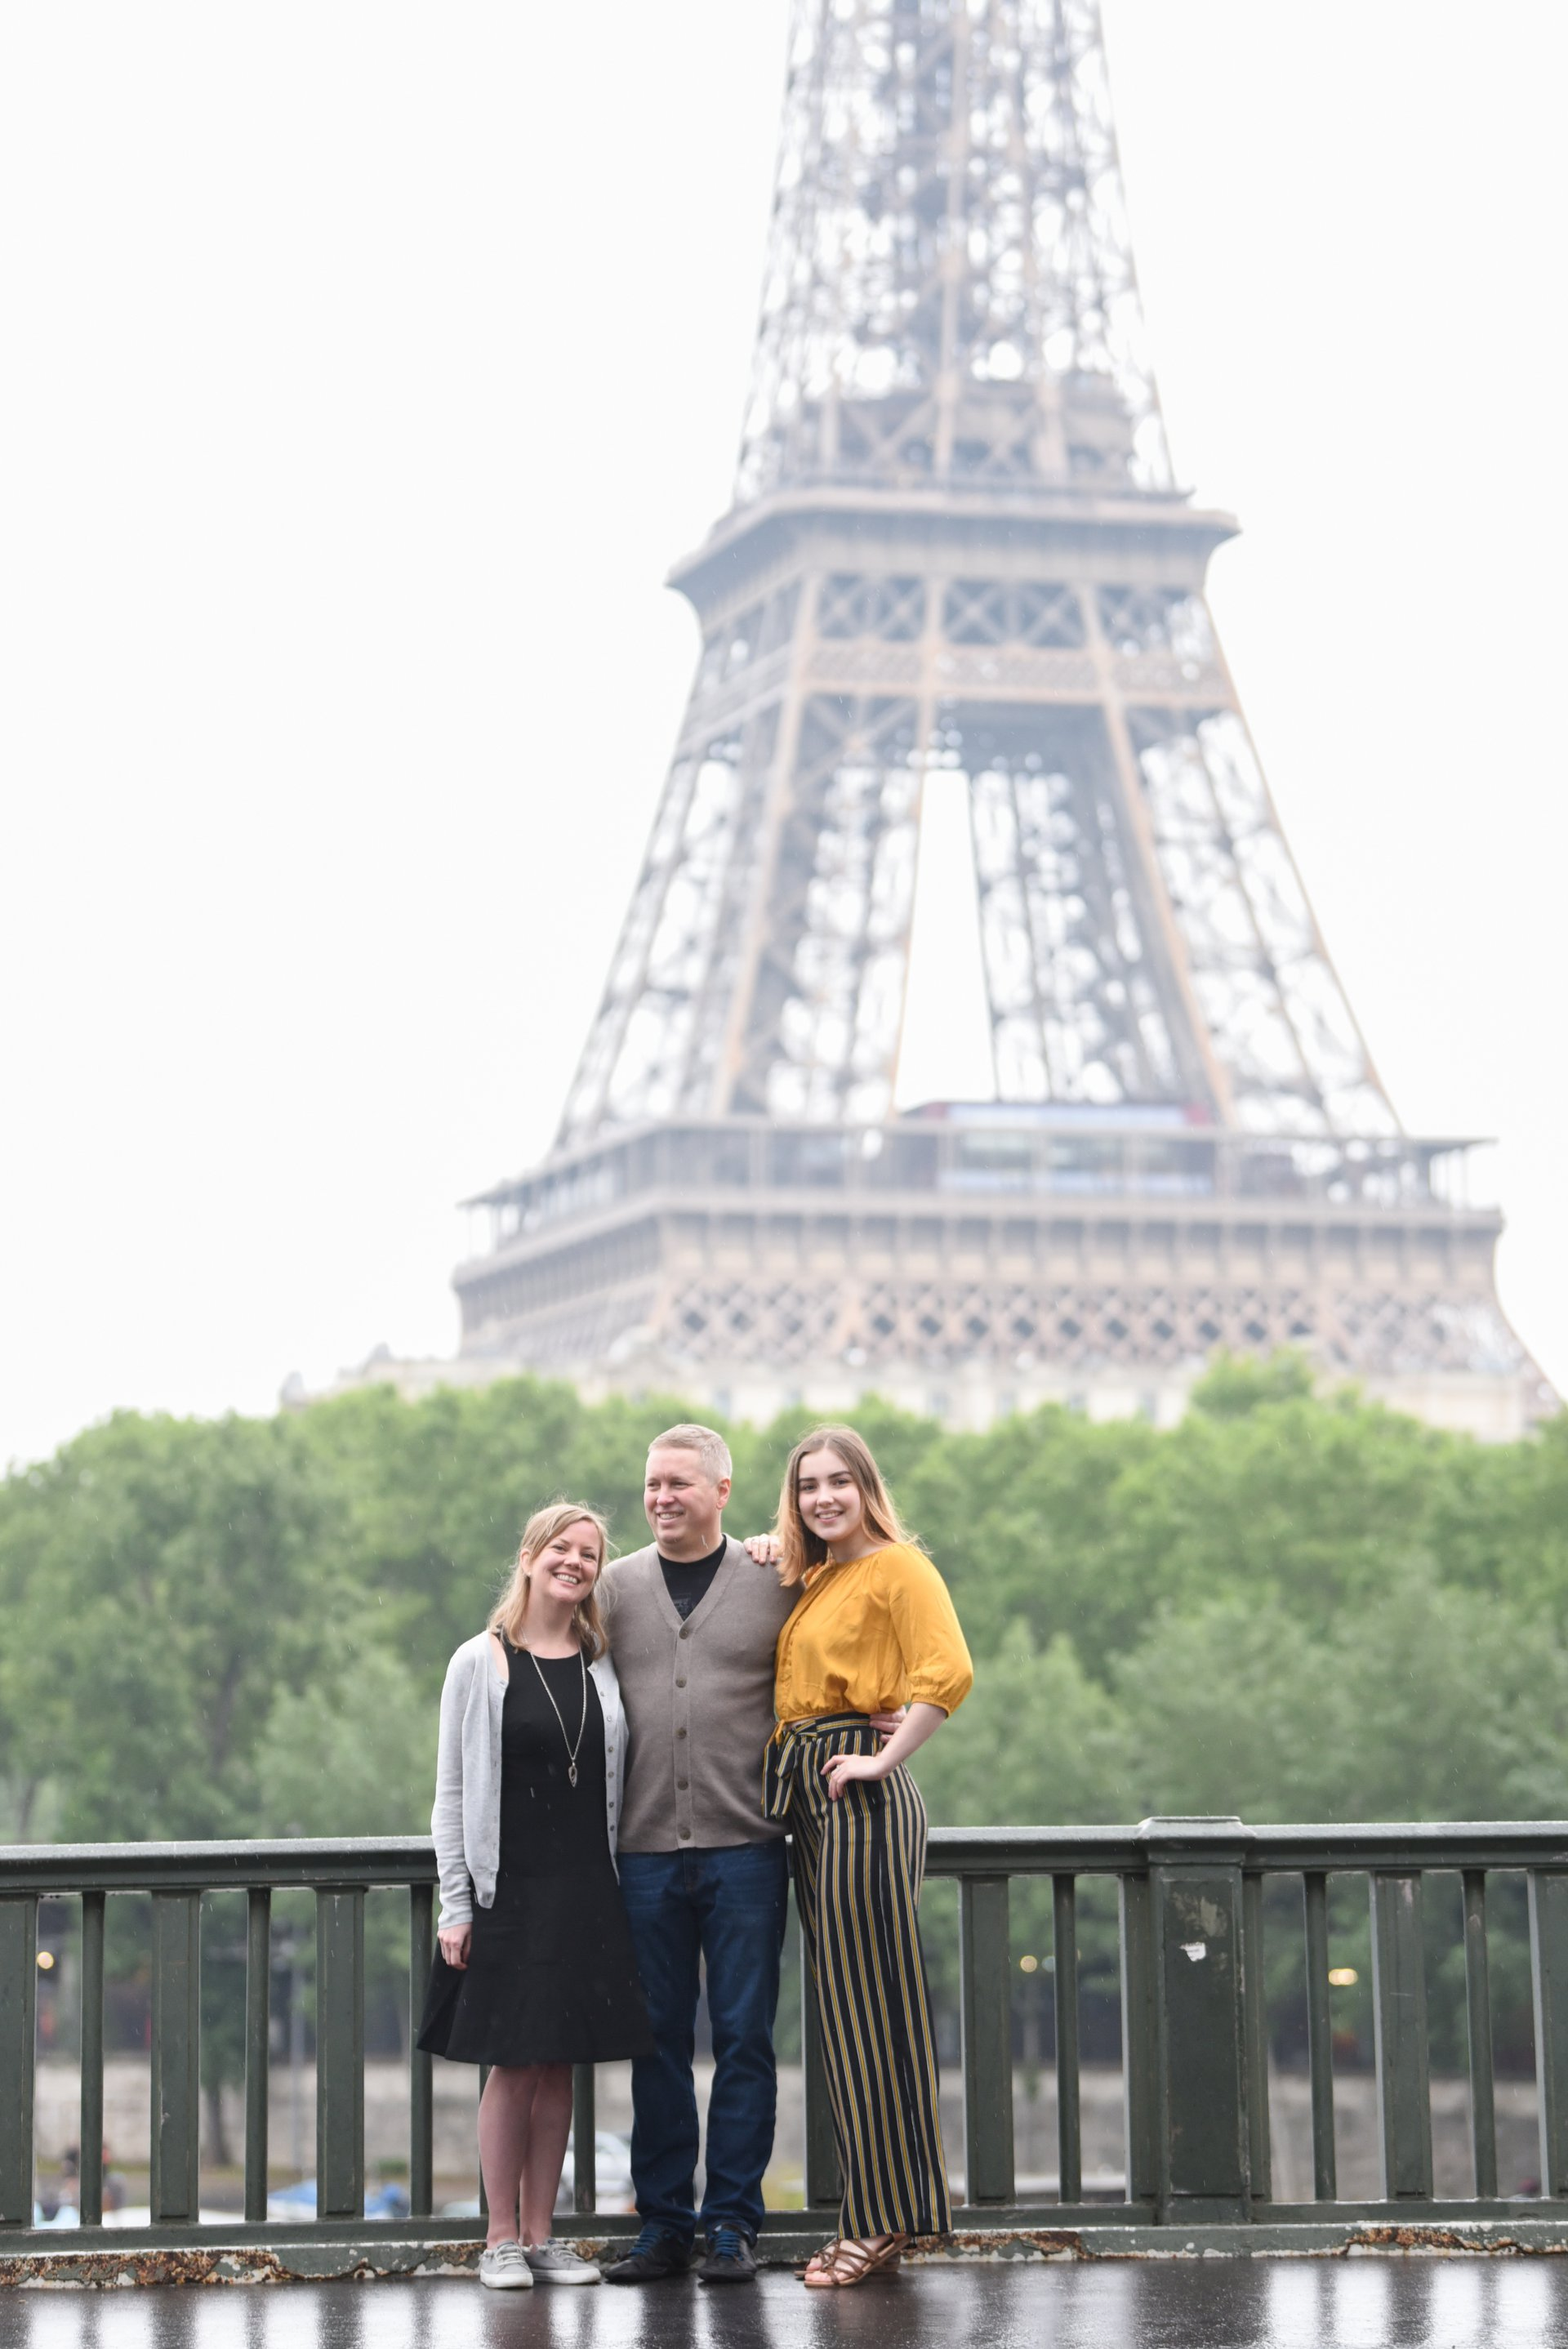 Paris-France-travel-story-Flytographer-16